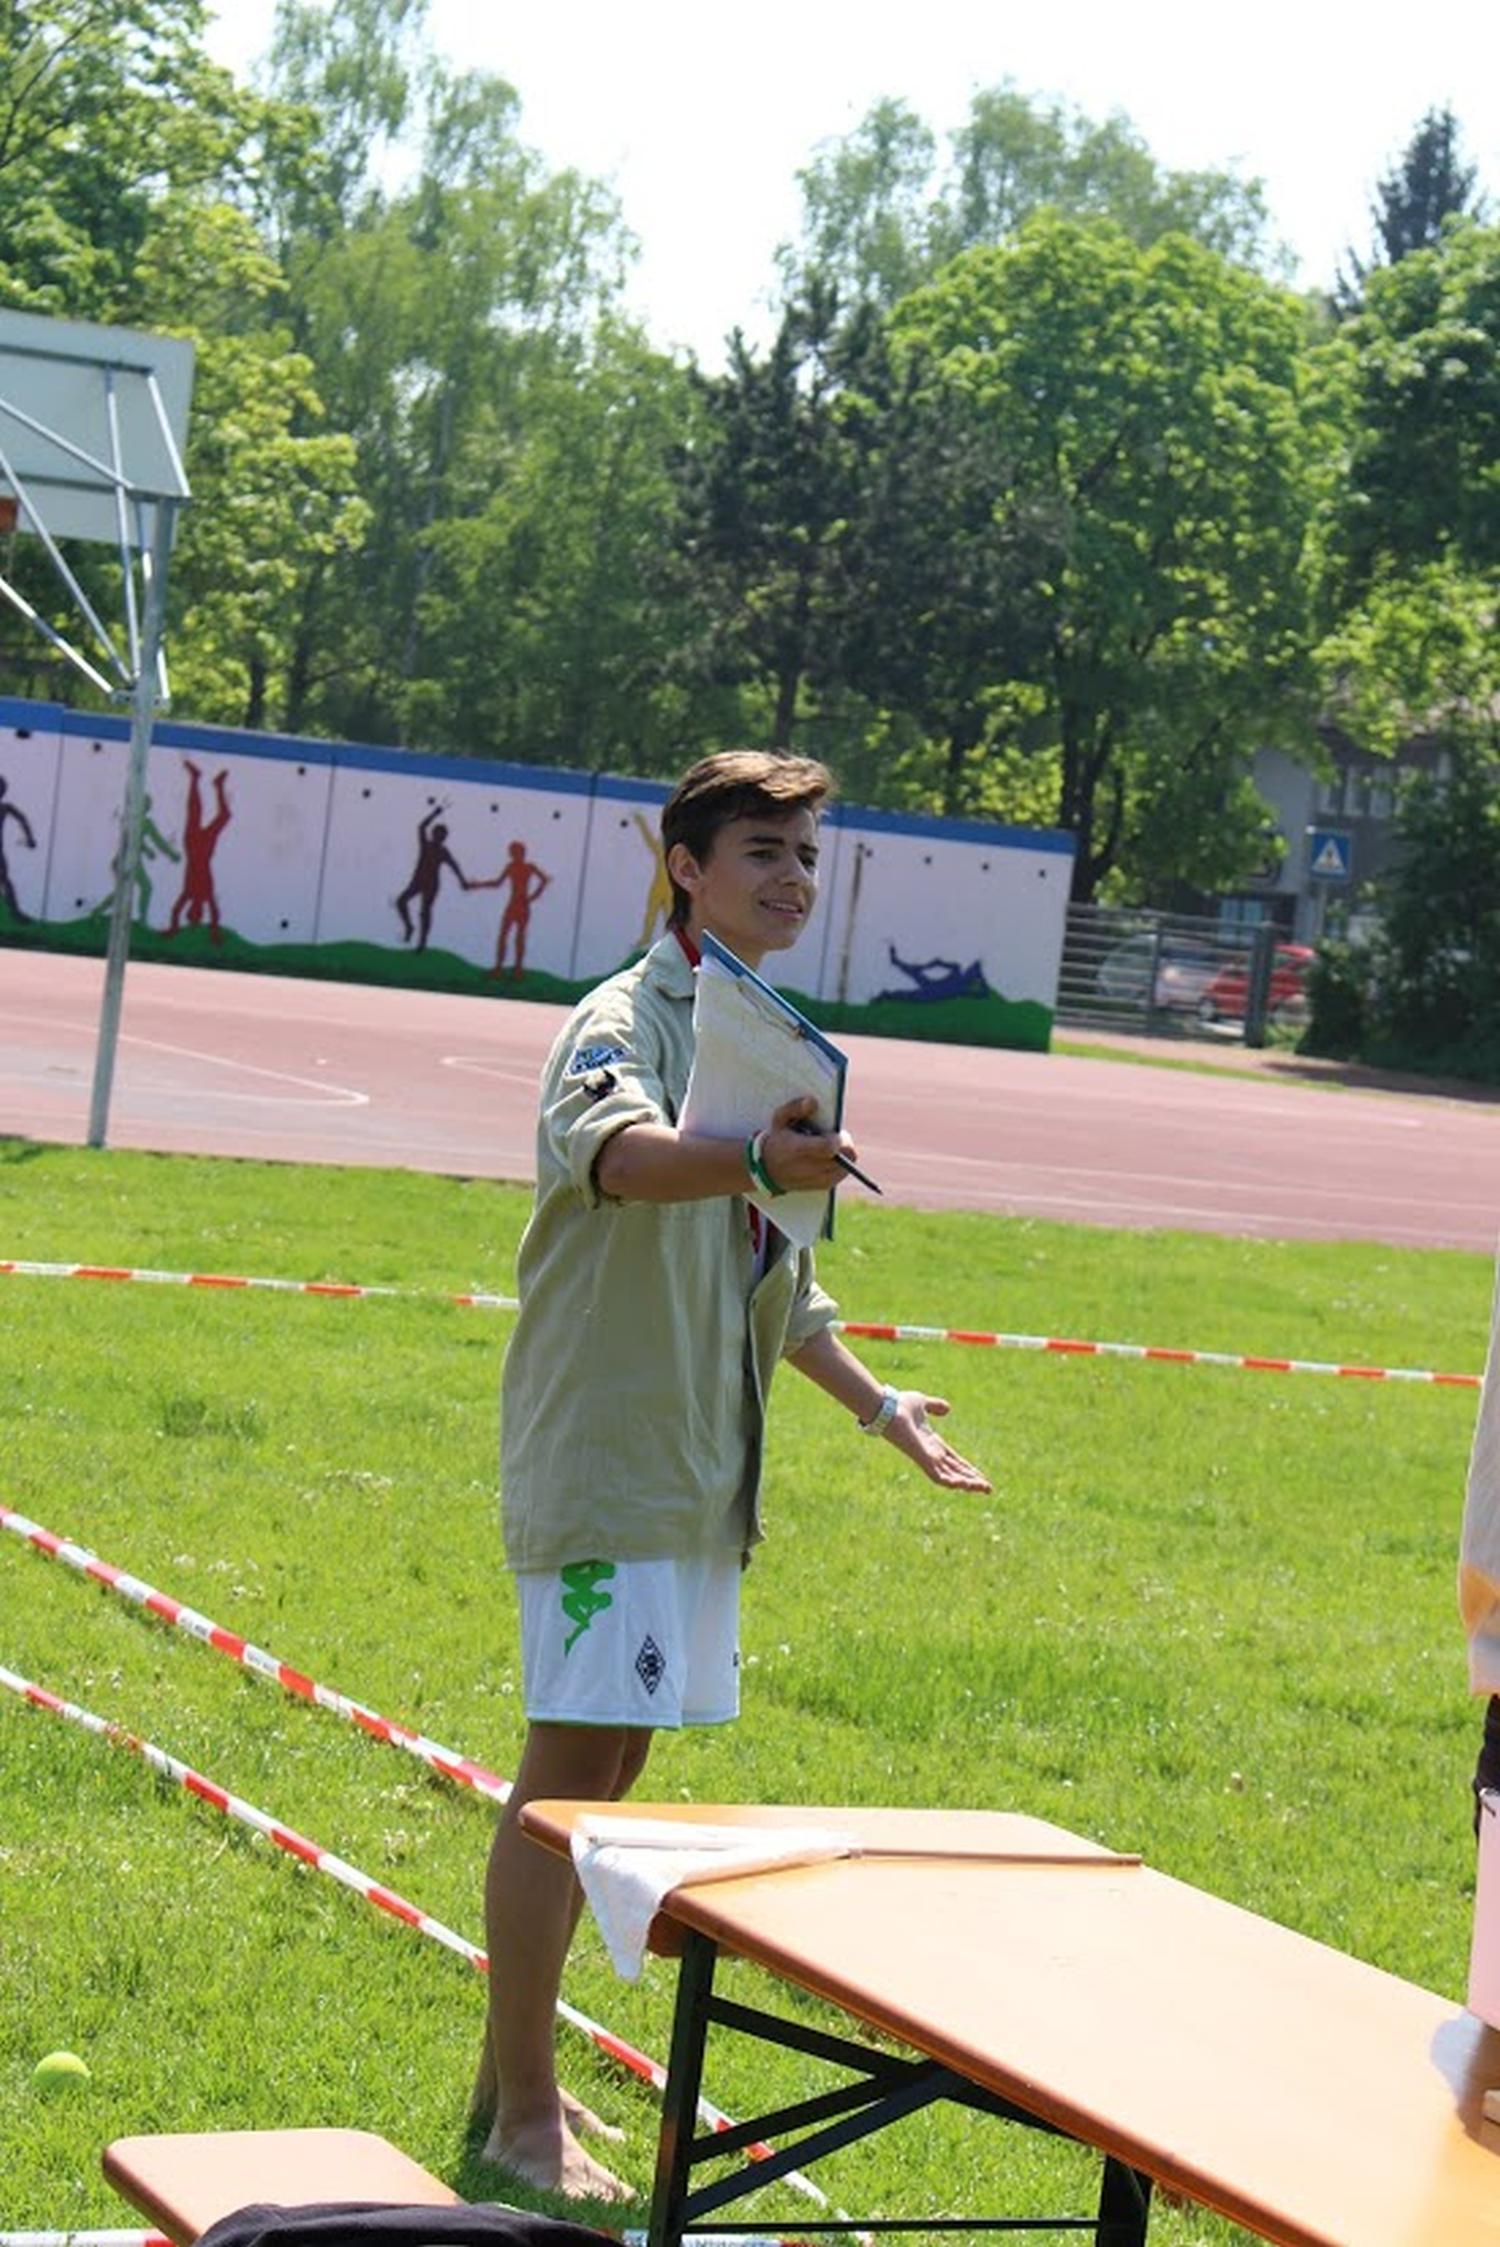 Bezirks Jupfi Scoutball Turnier 2015 02